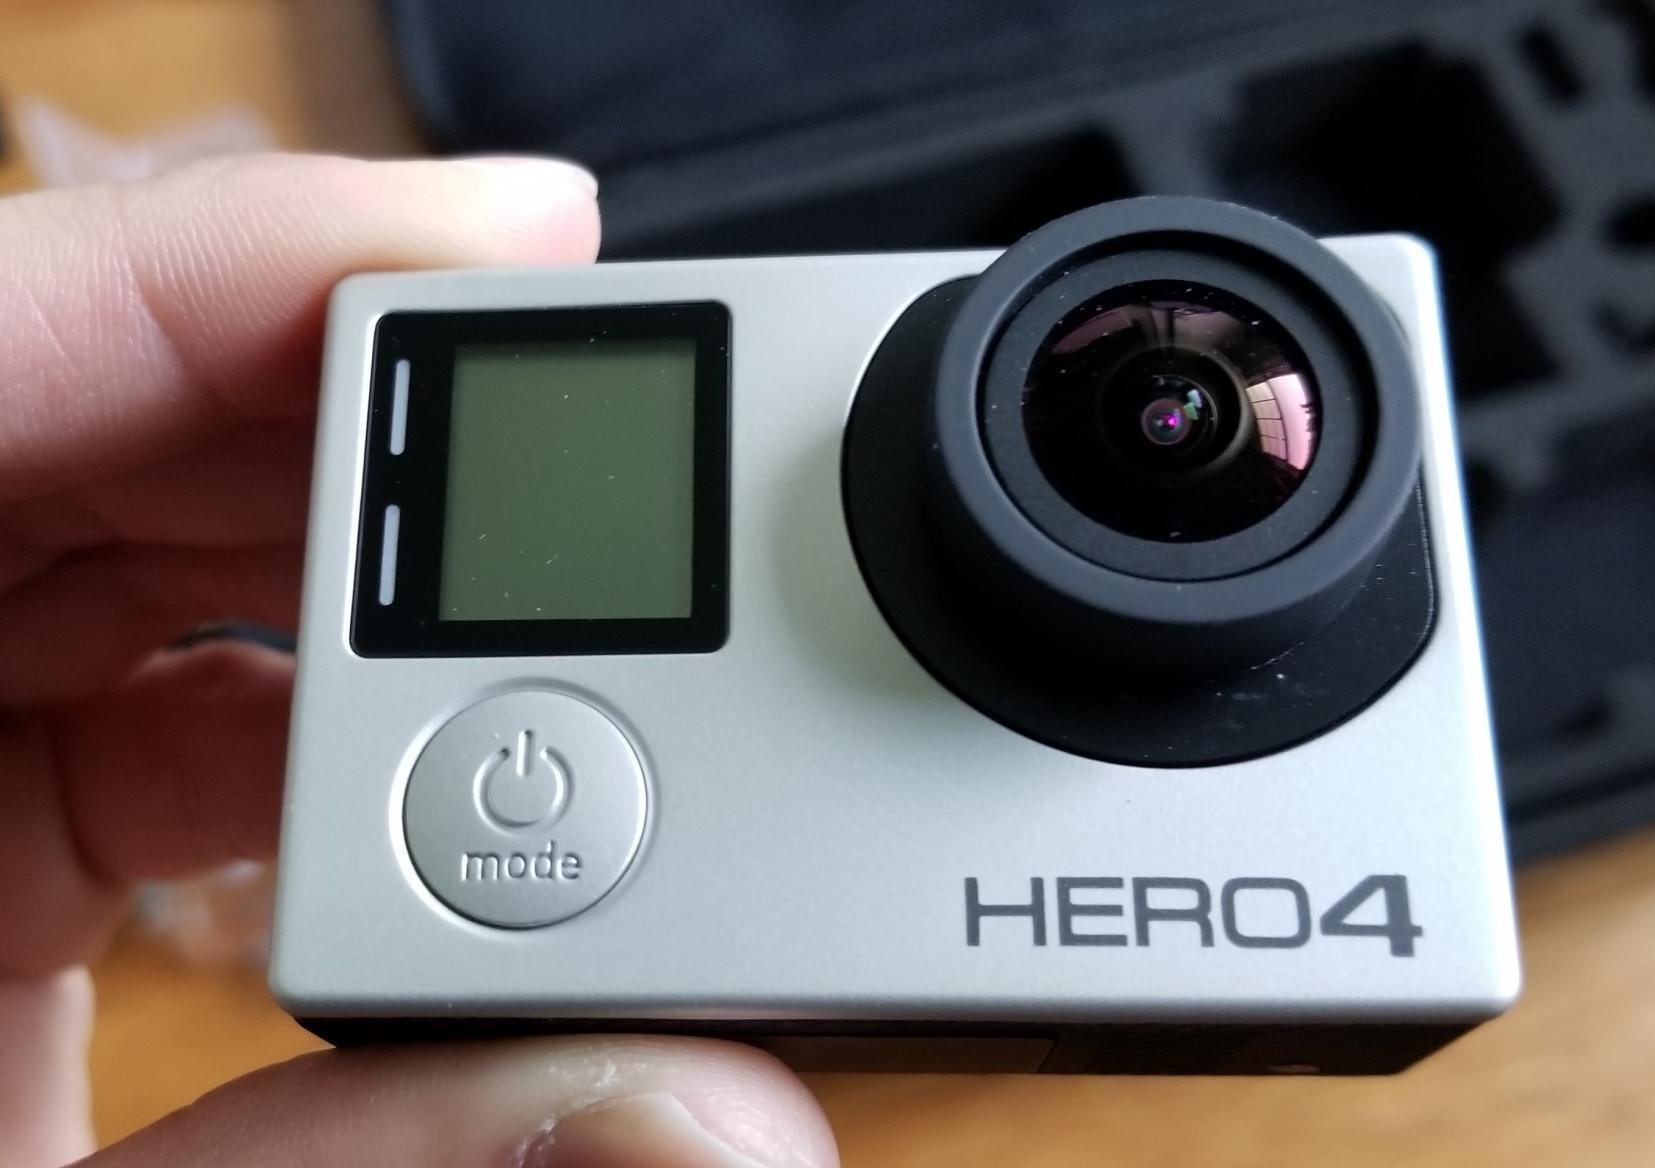 FS: GoPro Hero 4 Silver, SF bay area, 0-20190414_174349-2-jpg